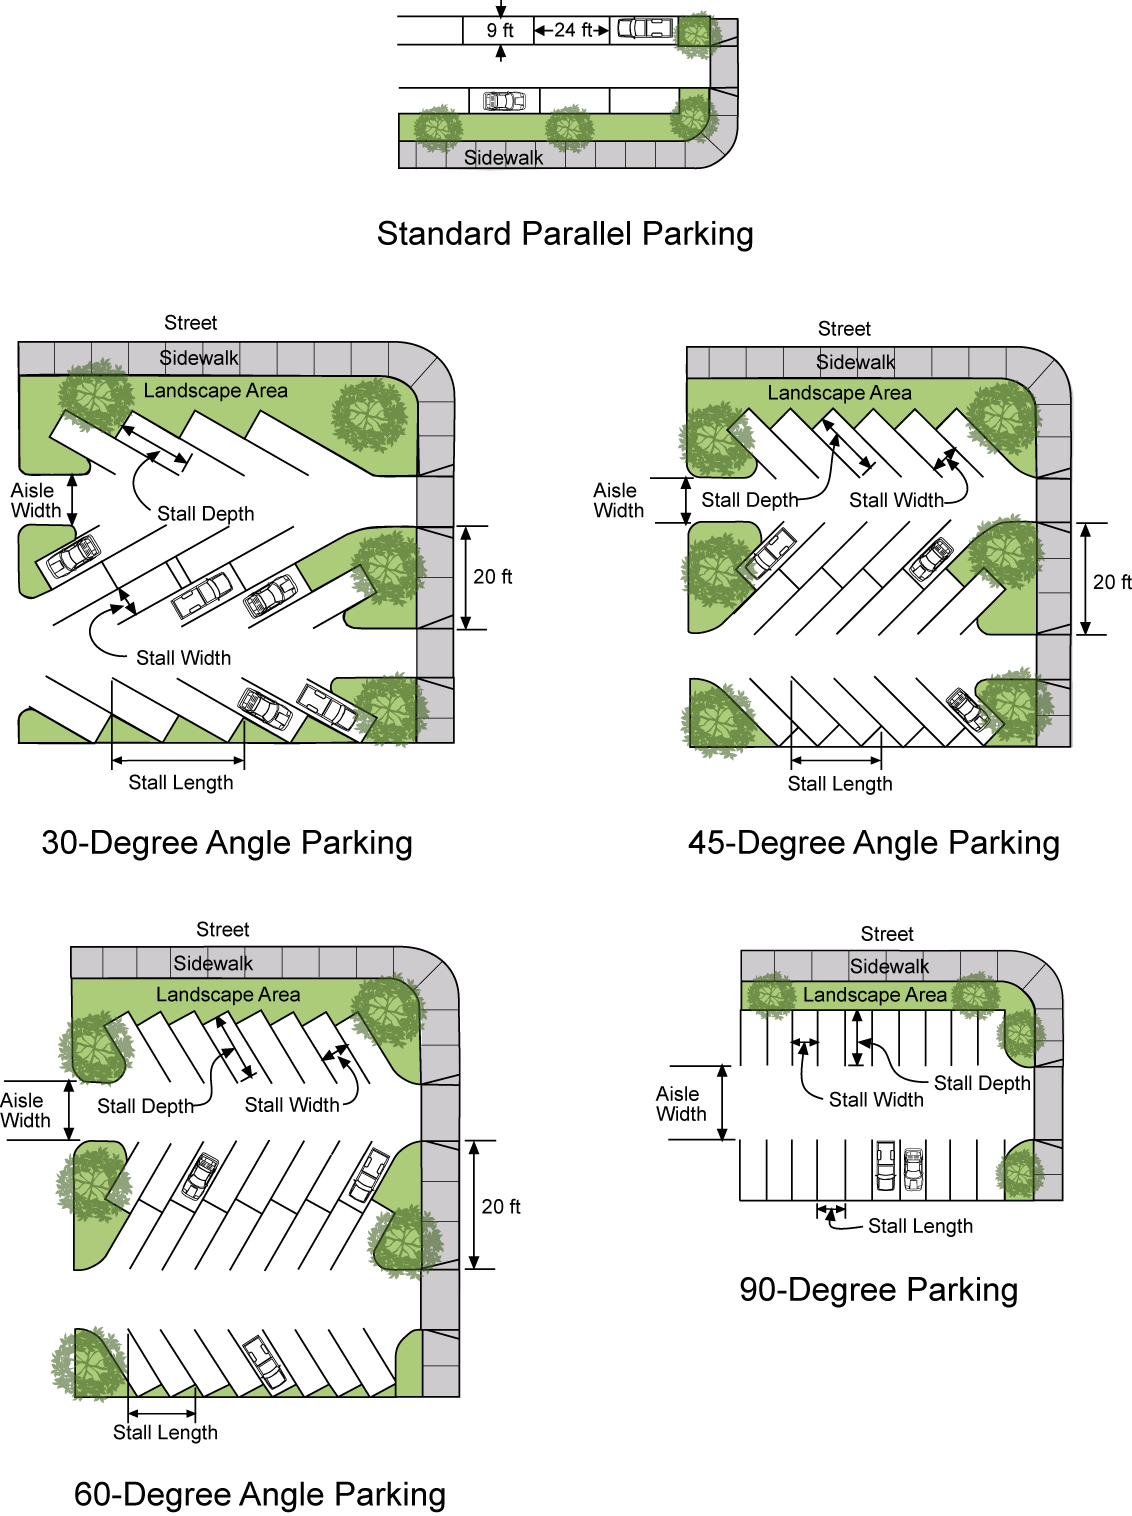 Chapter 19 38 Off Street Parking Regulations And Design